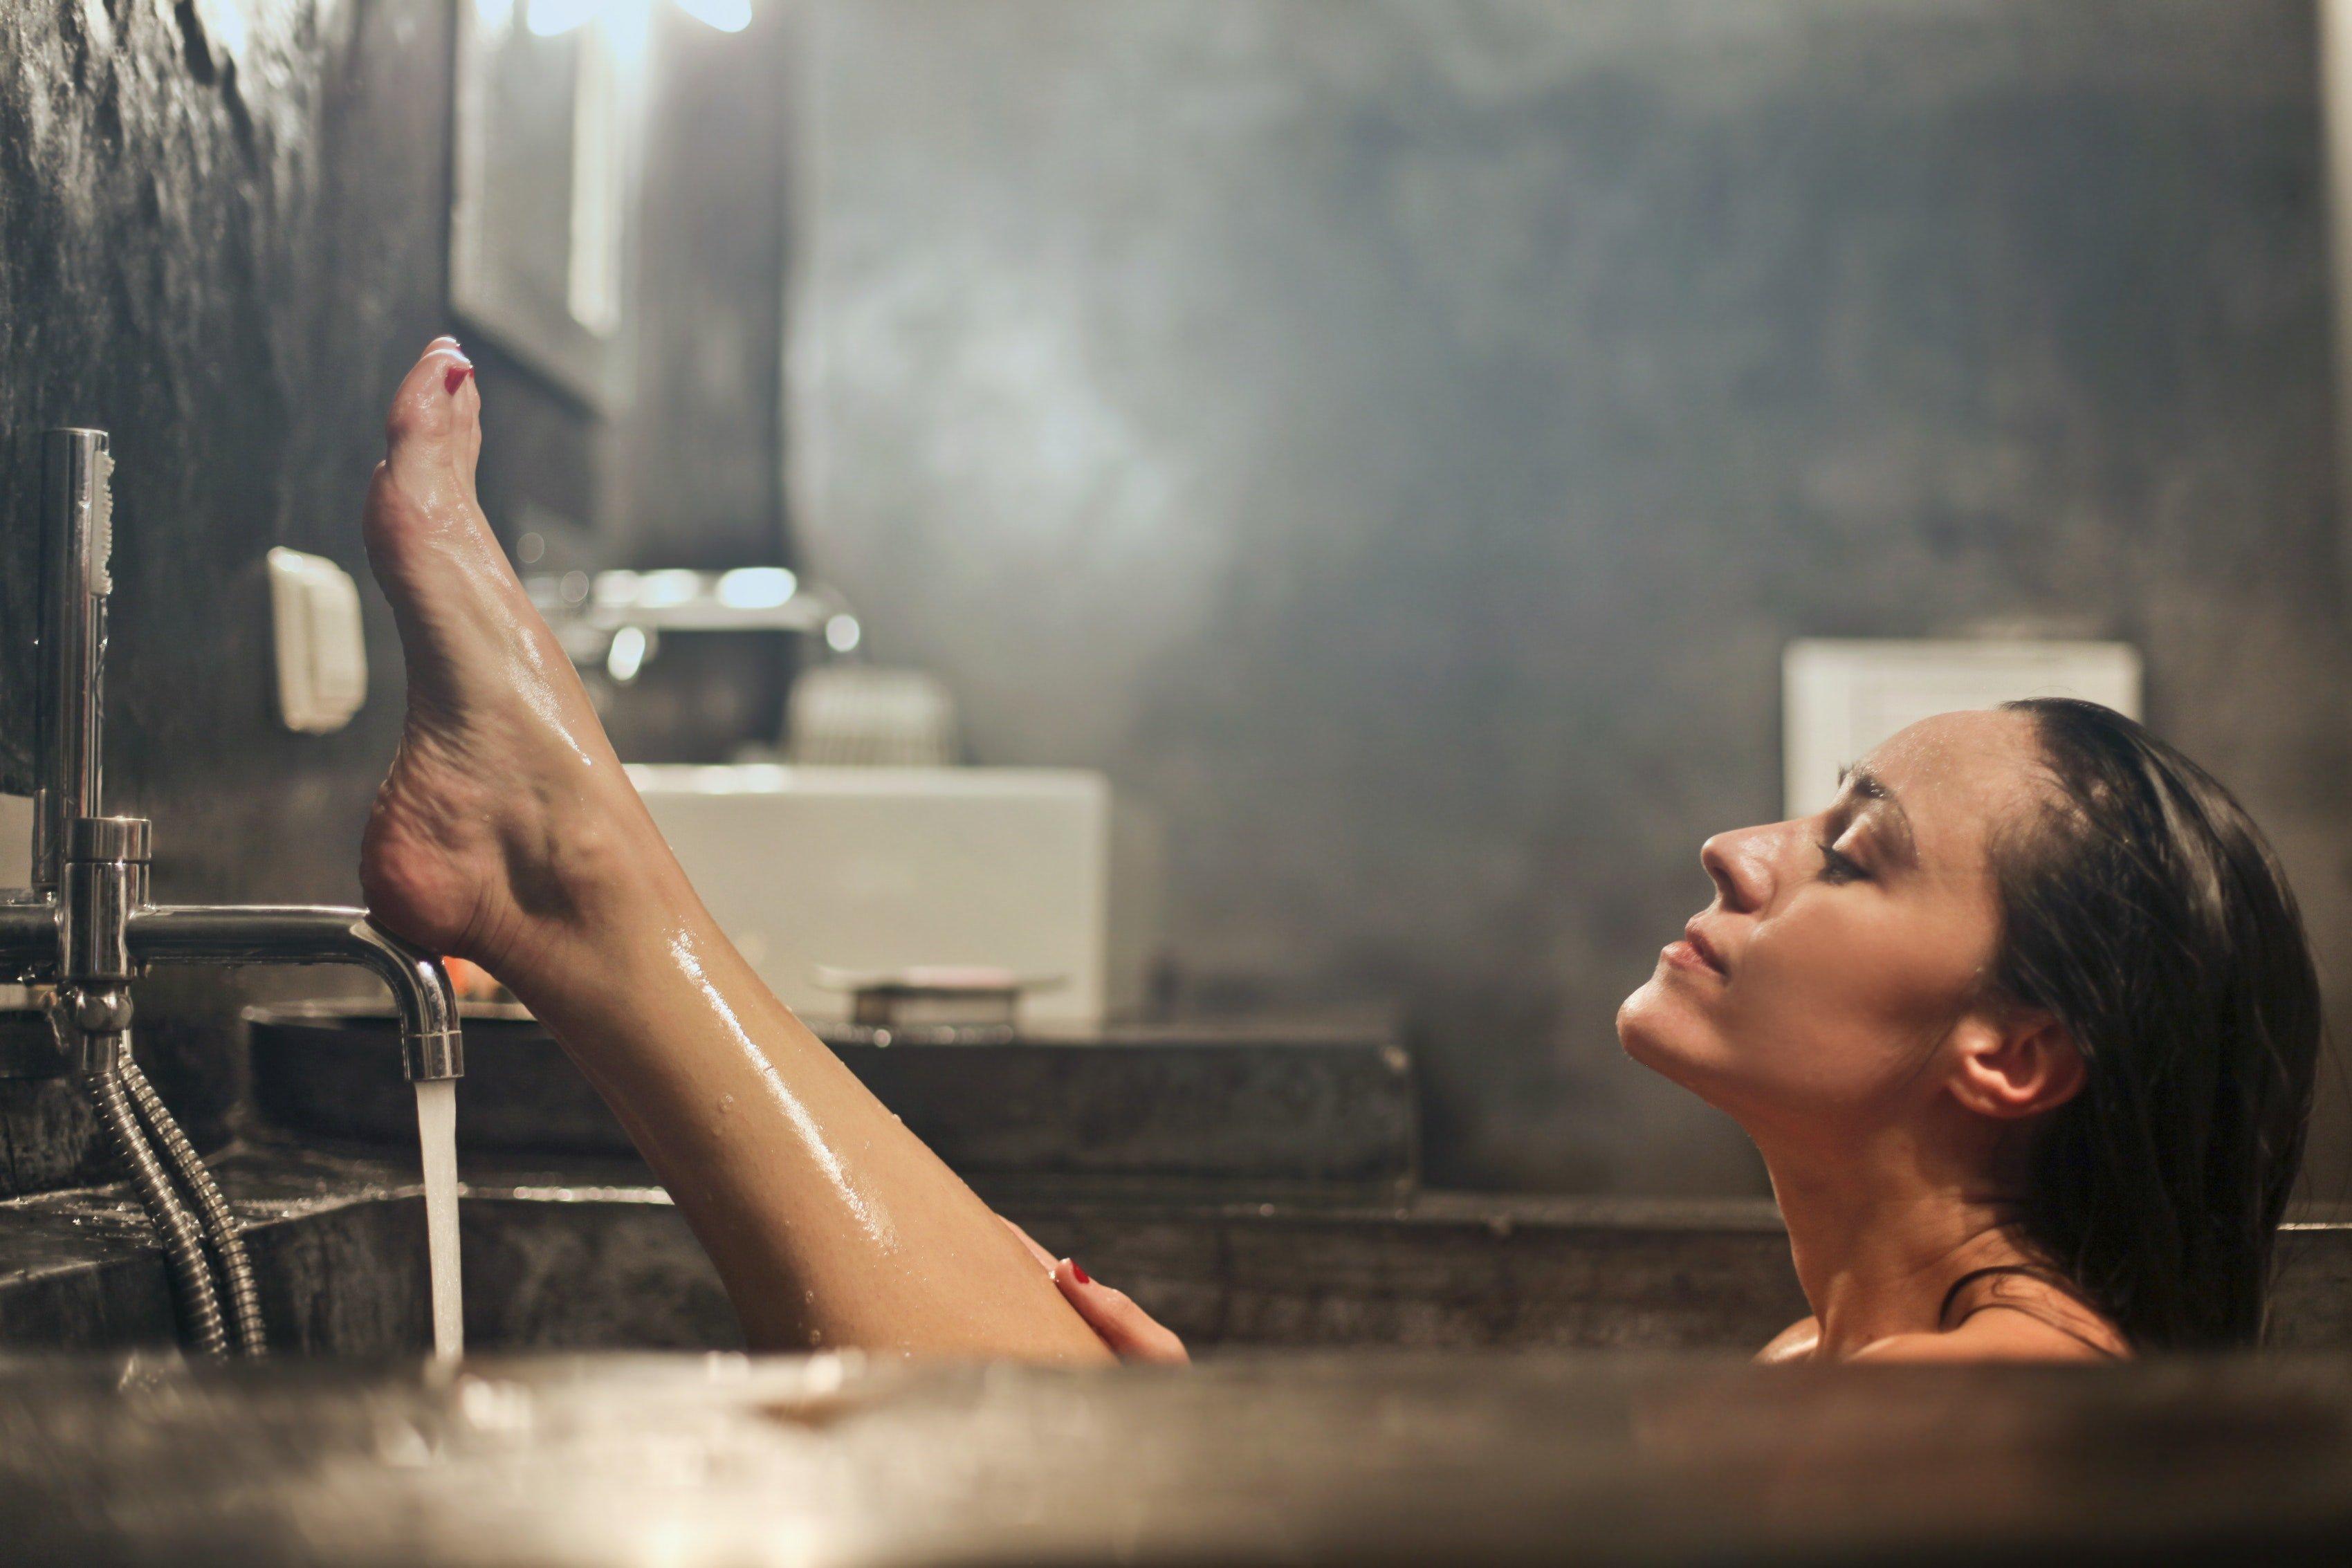 Mujer toma baño en la bañera.   Foto: Pexels